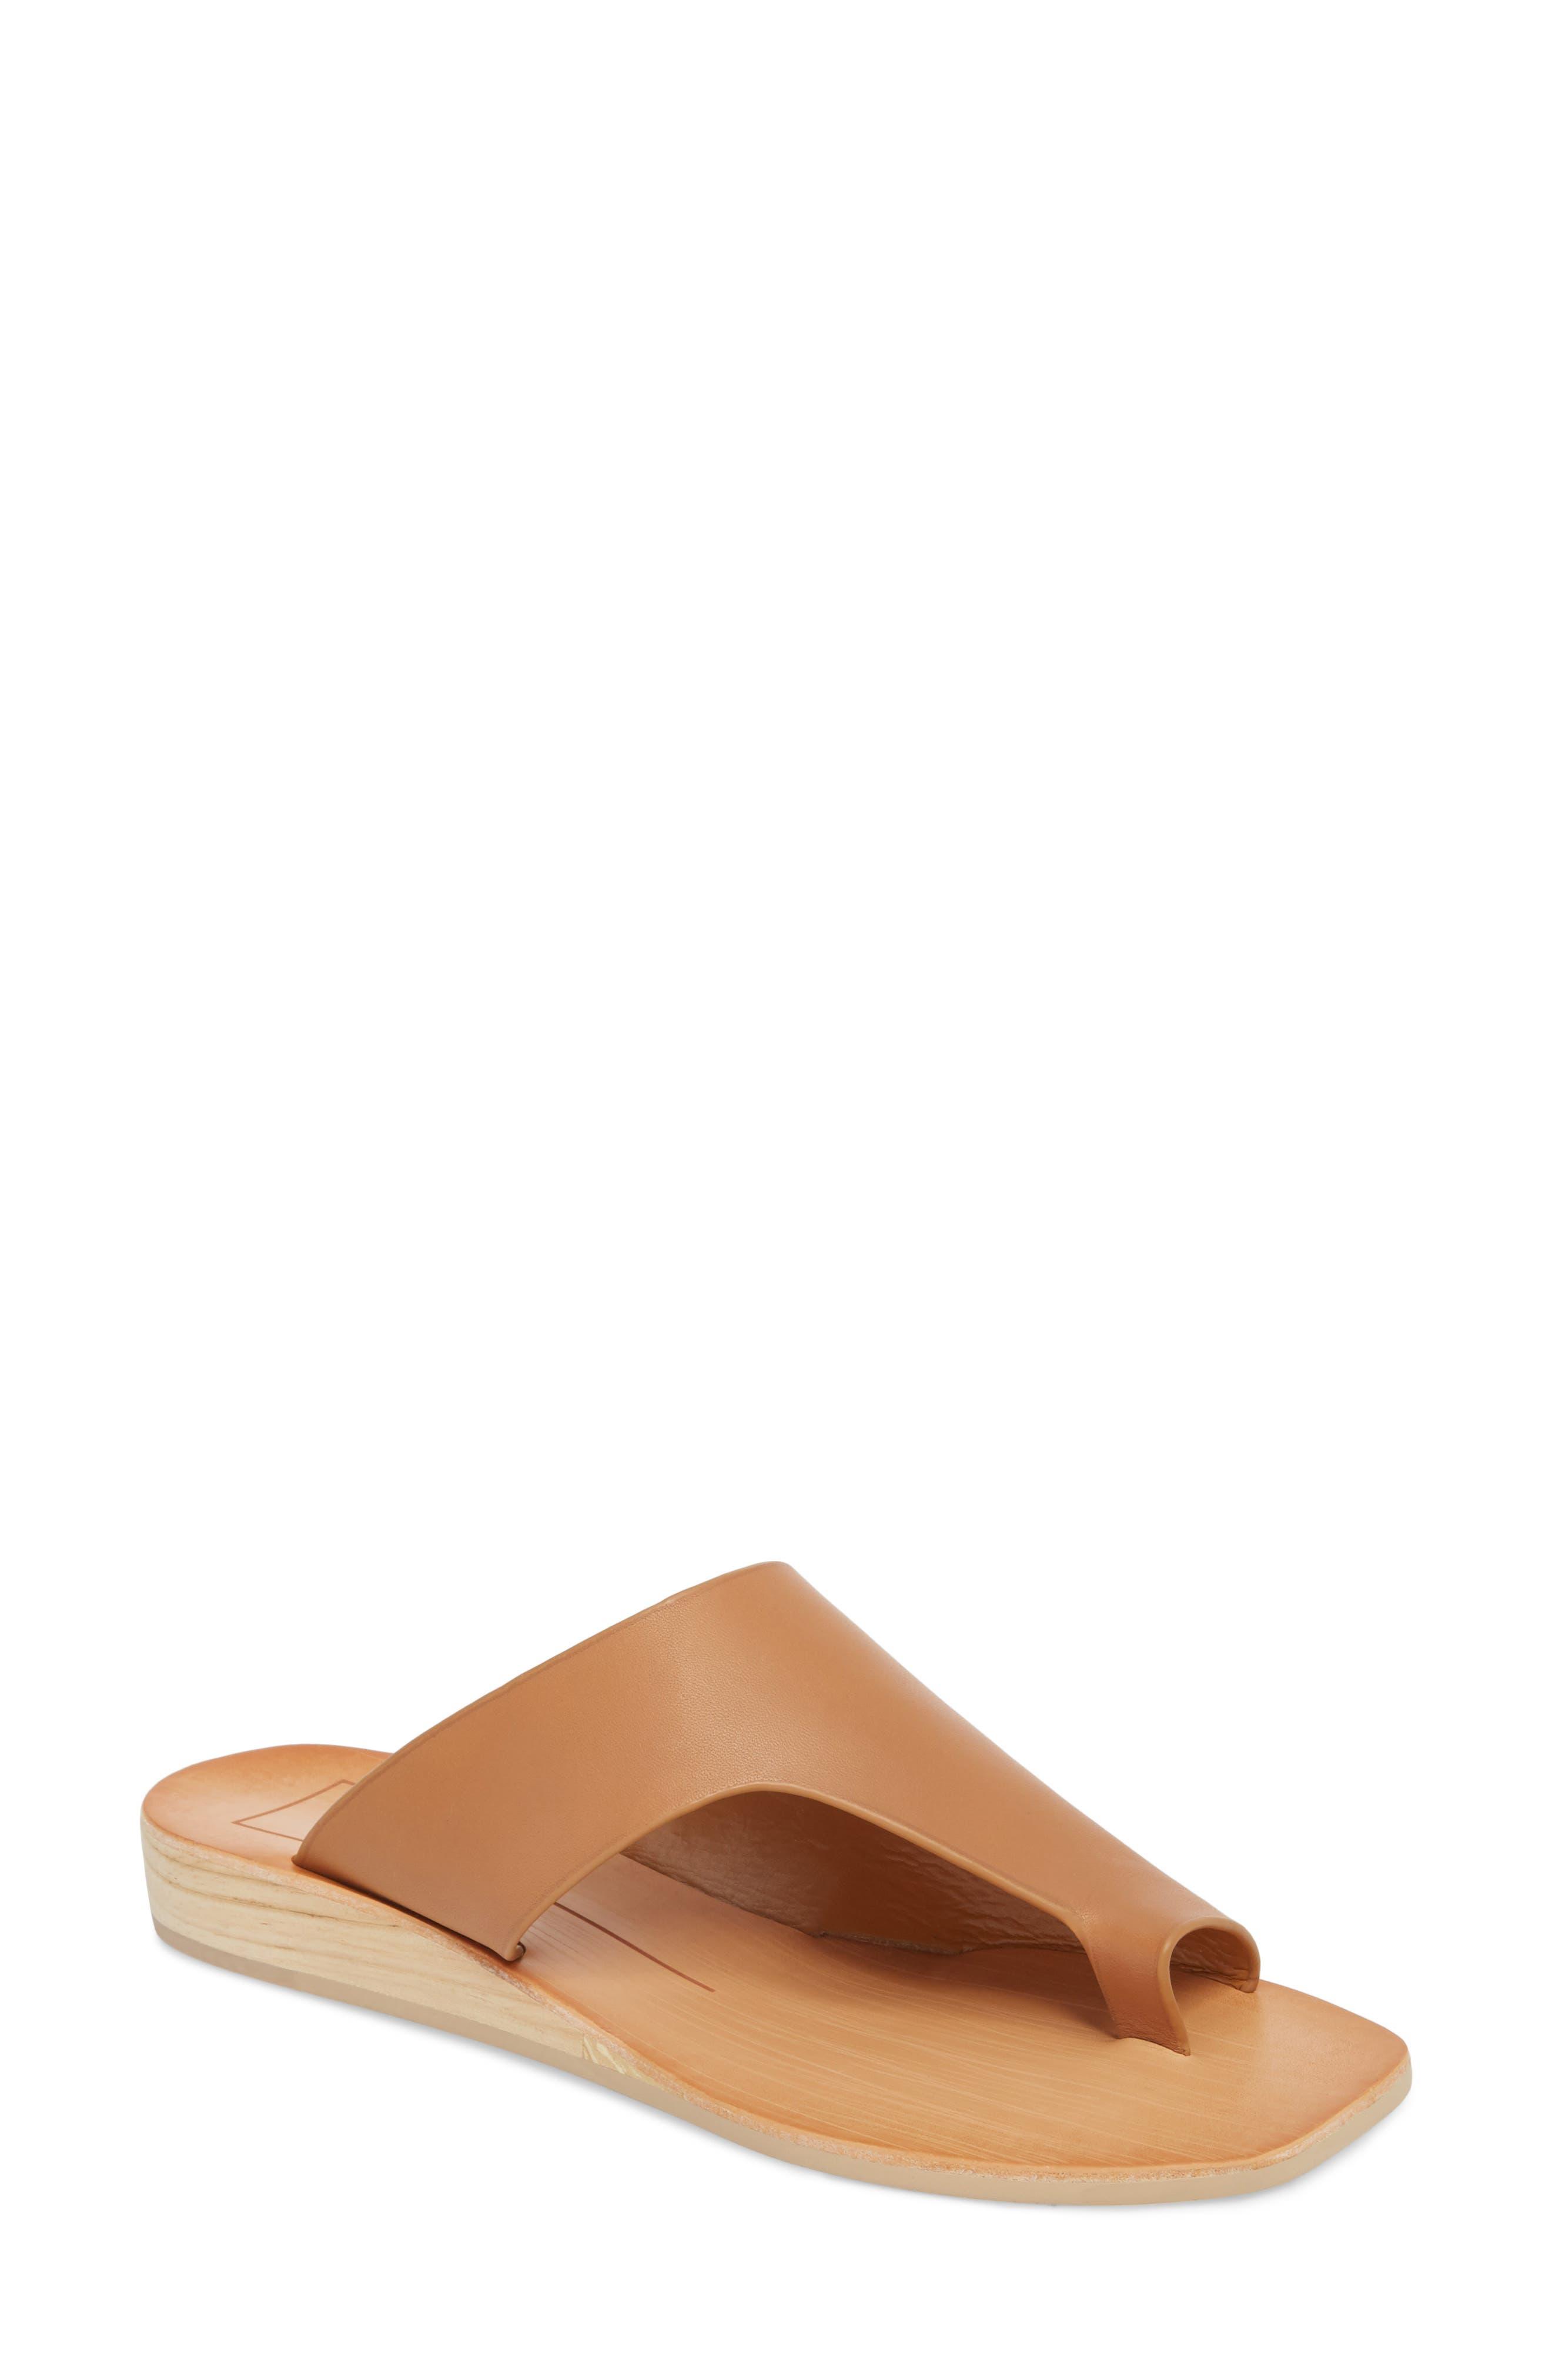 Hazle Asymmetrical Toe Loop Sandal,                         Main,                         color, Caramel